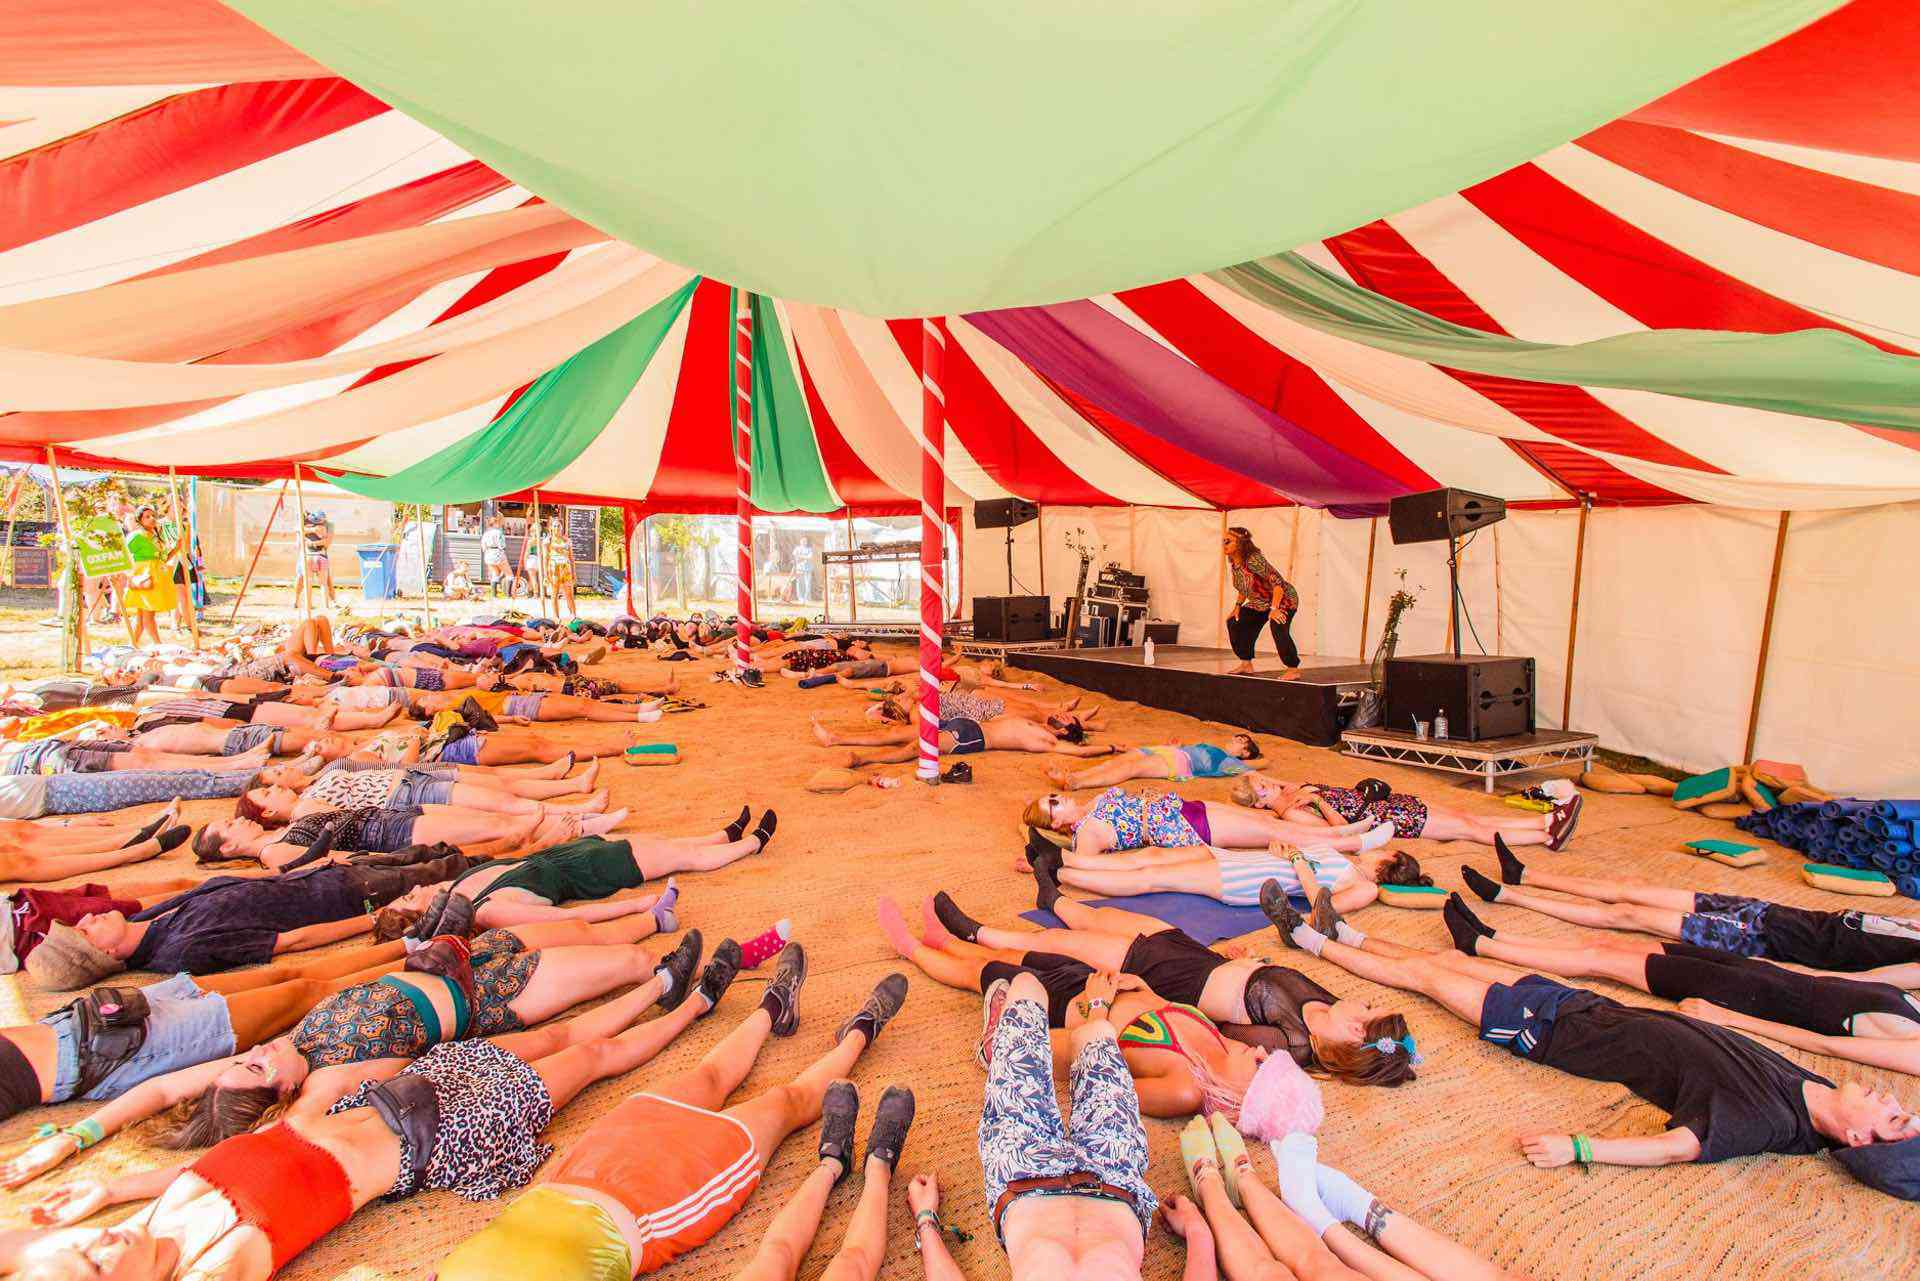 festival big top hire yoga tent at Camp Bestival in Dorset uk